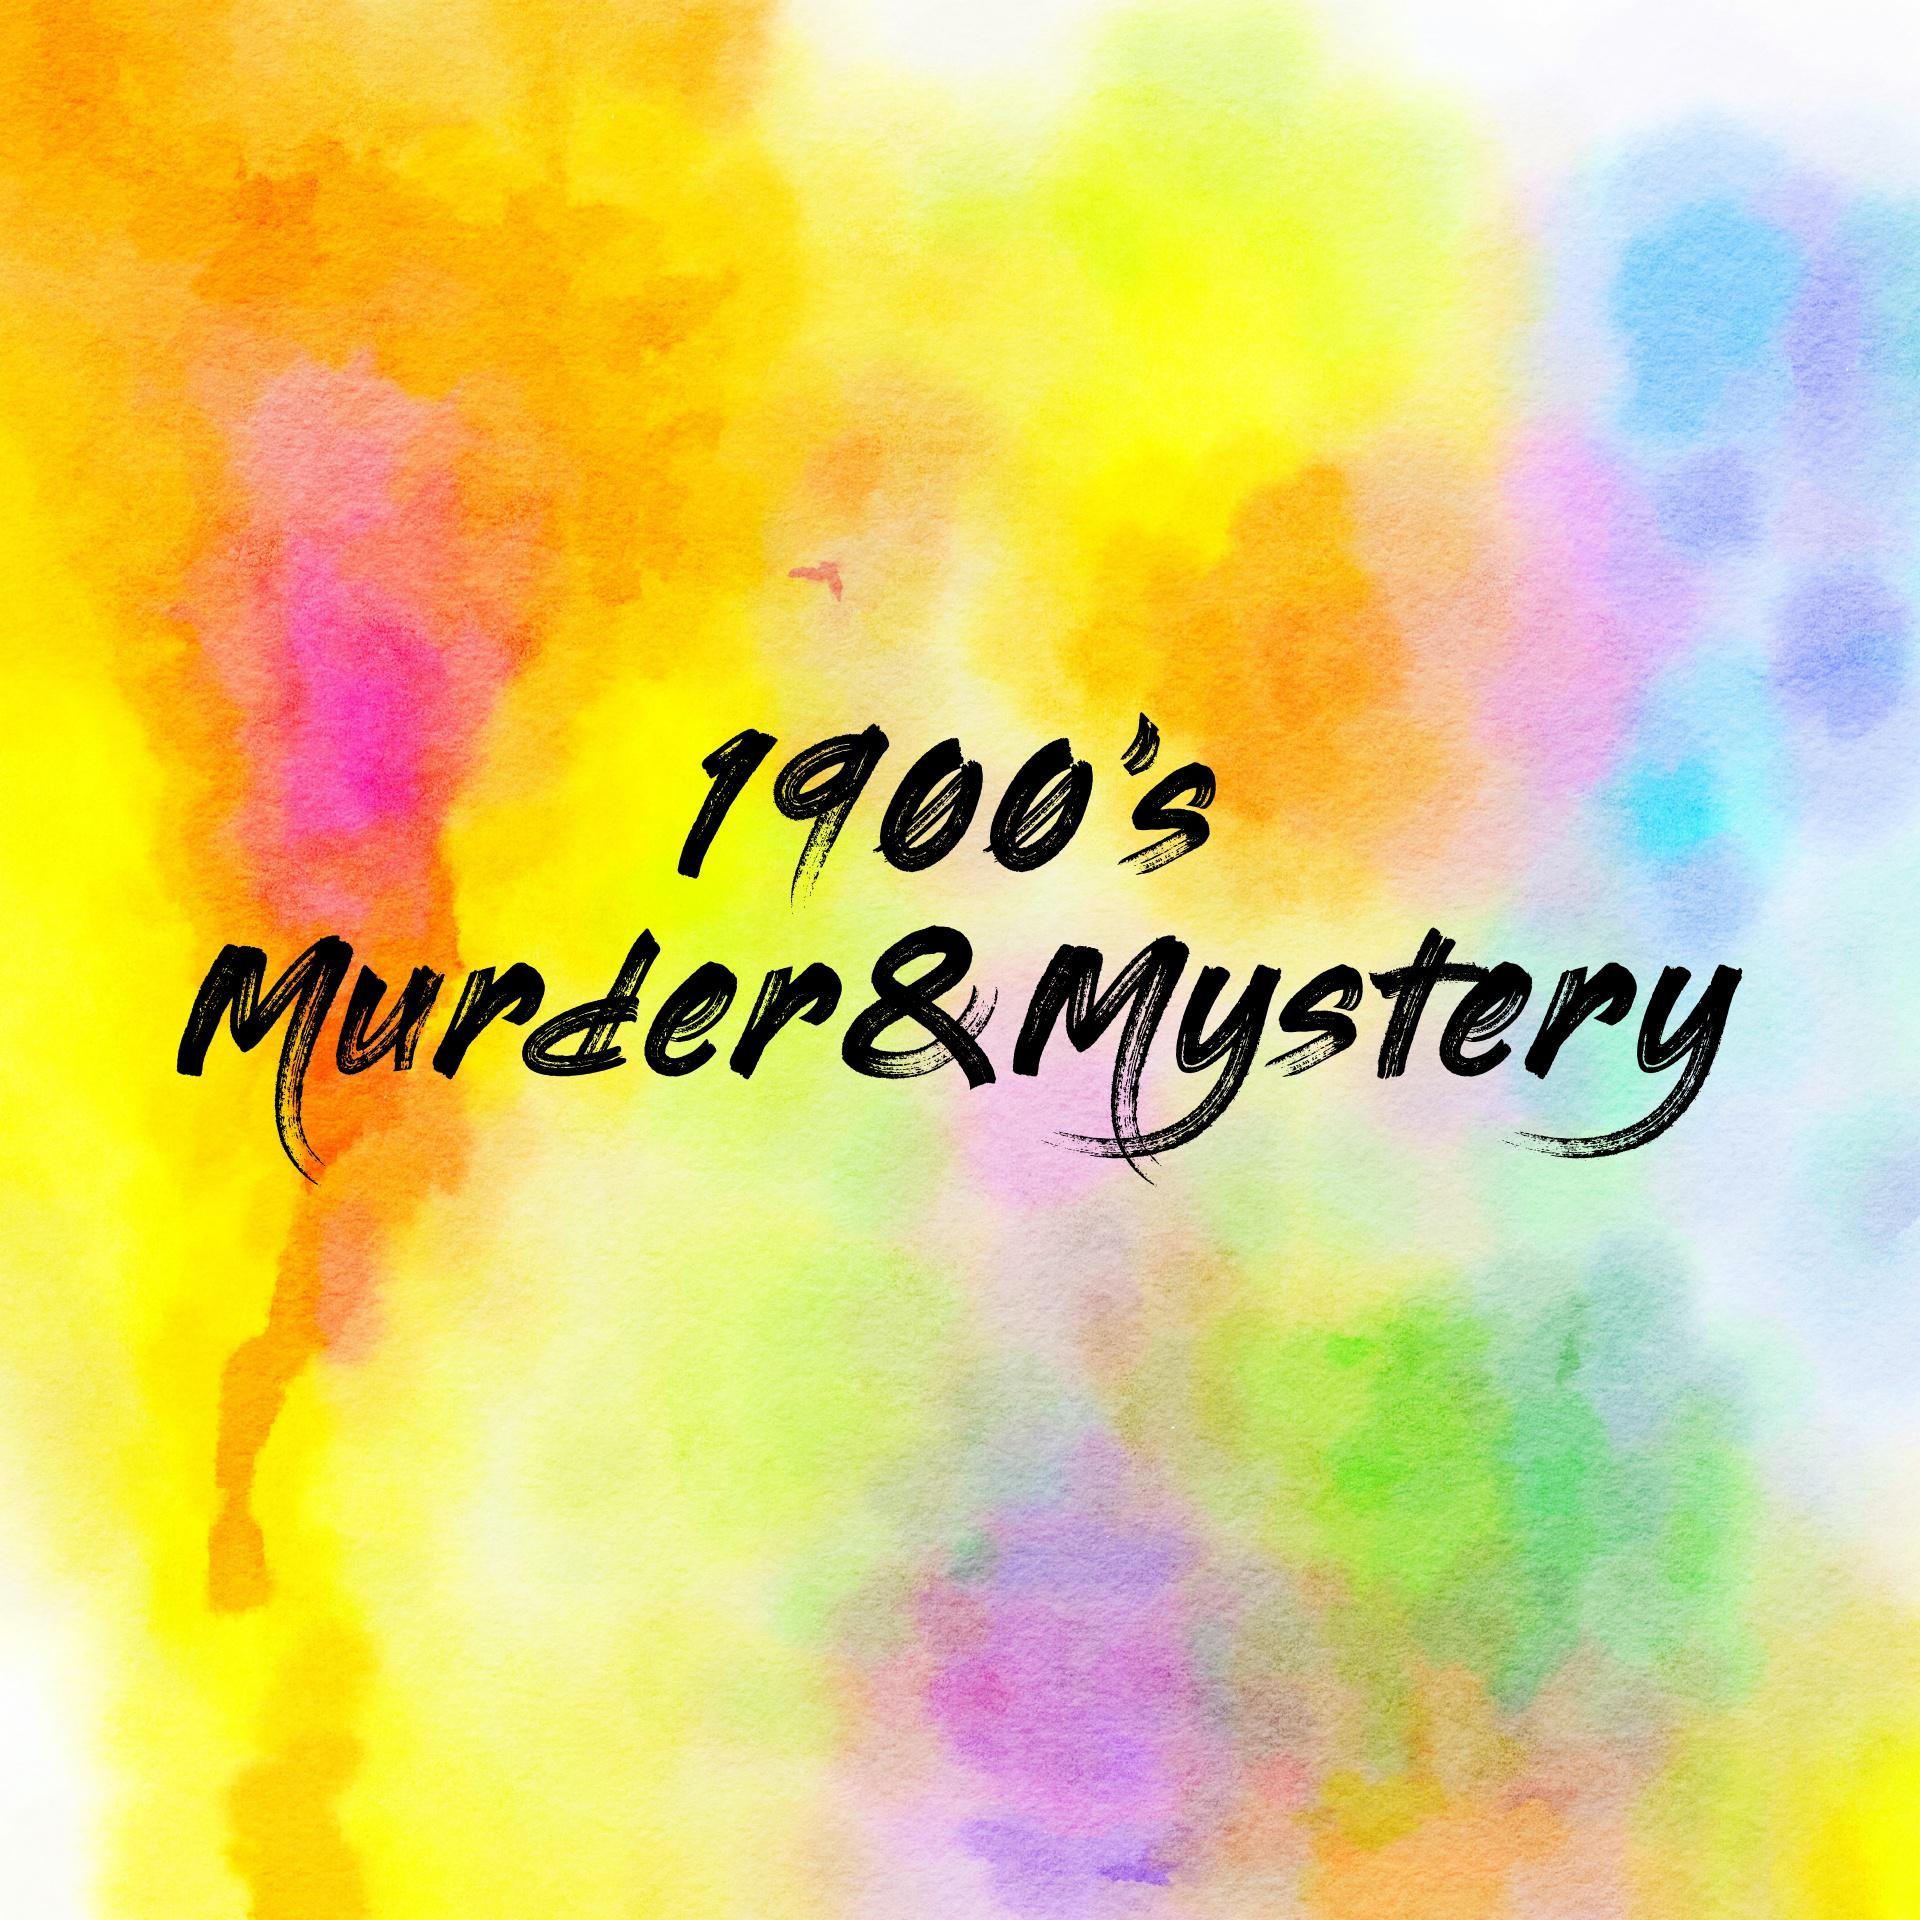 1900's Murder&Mystery